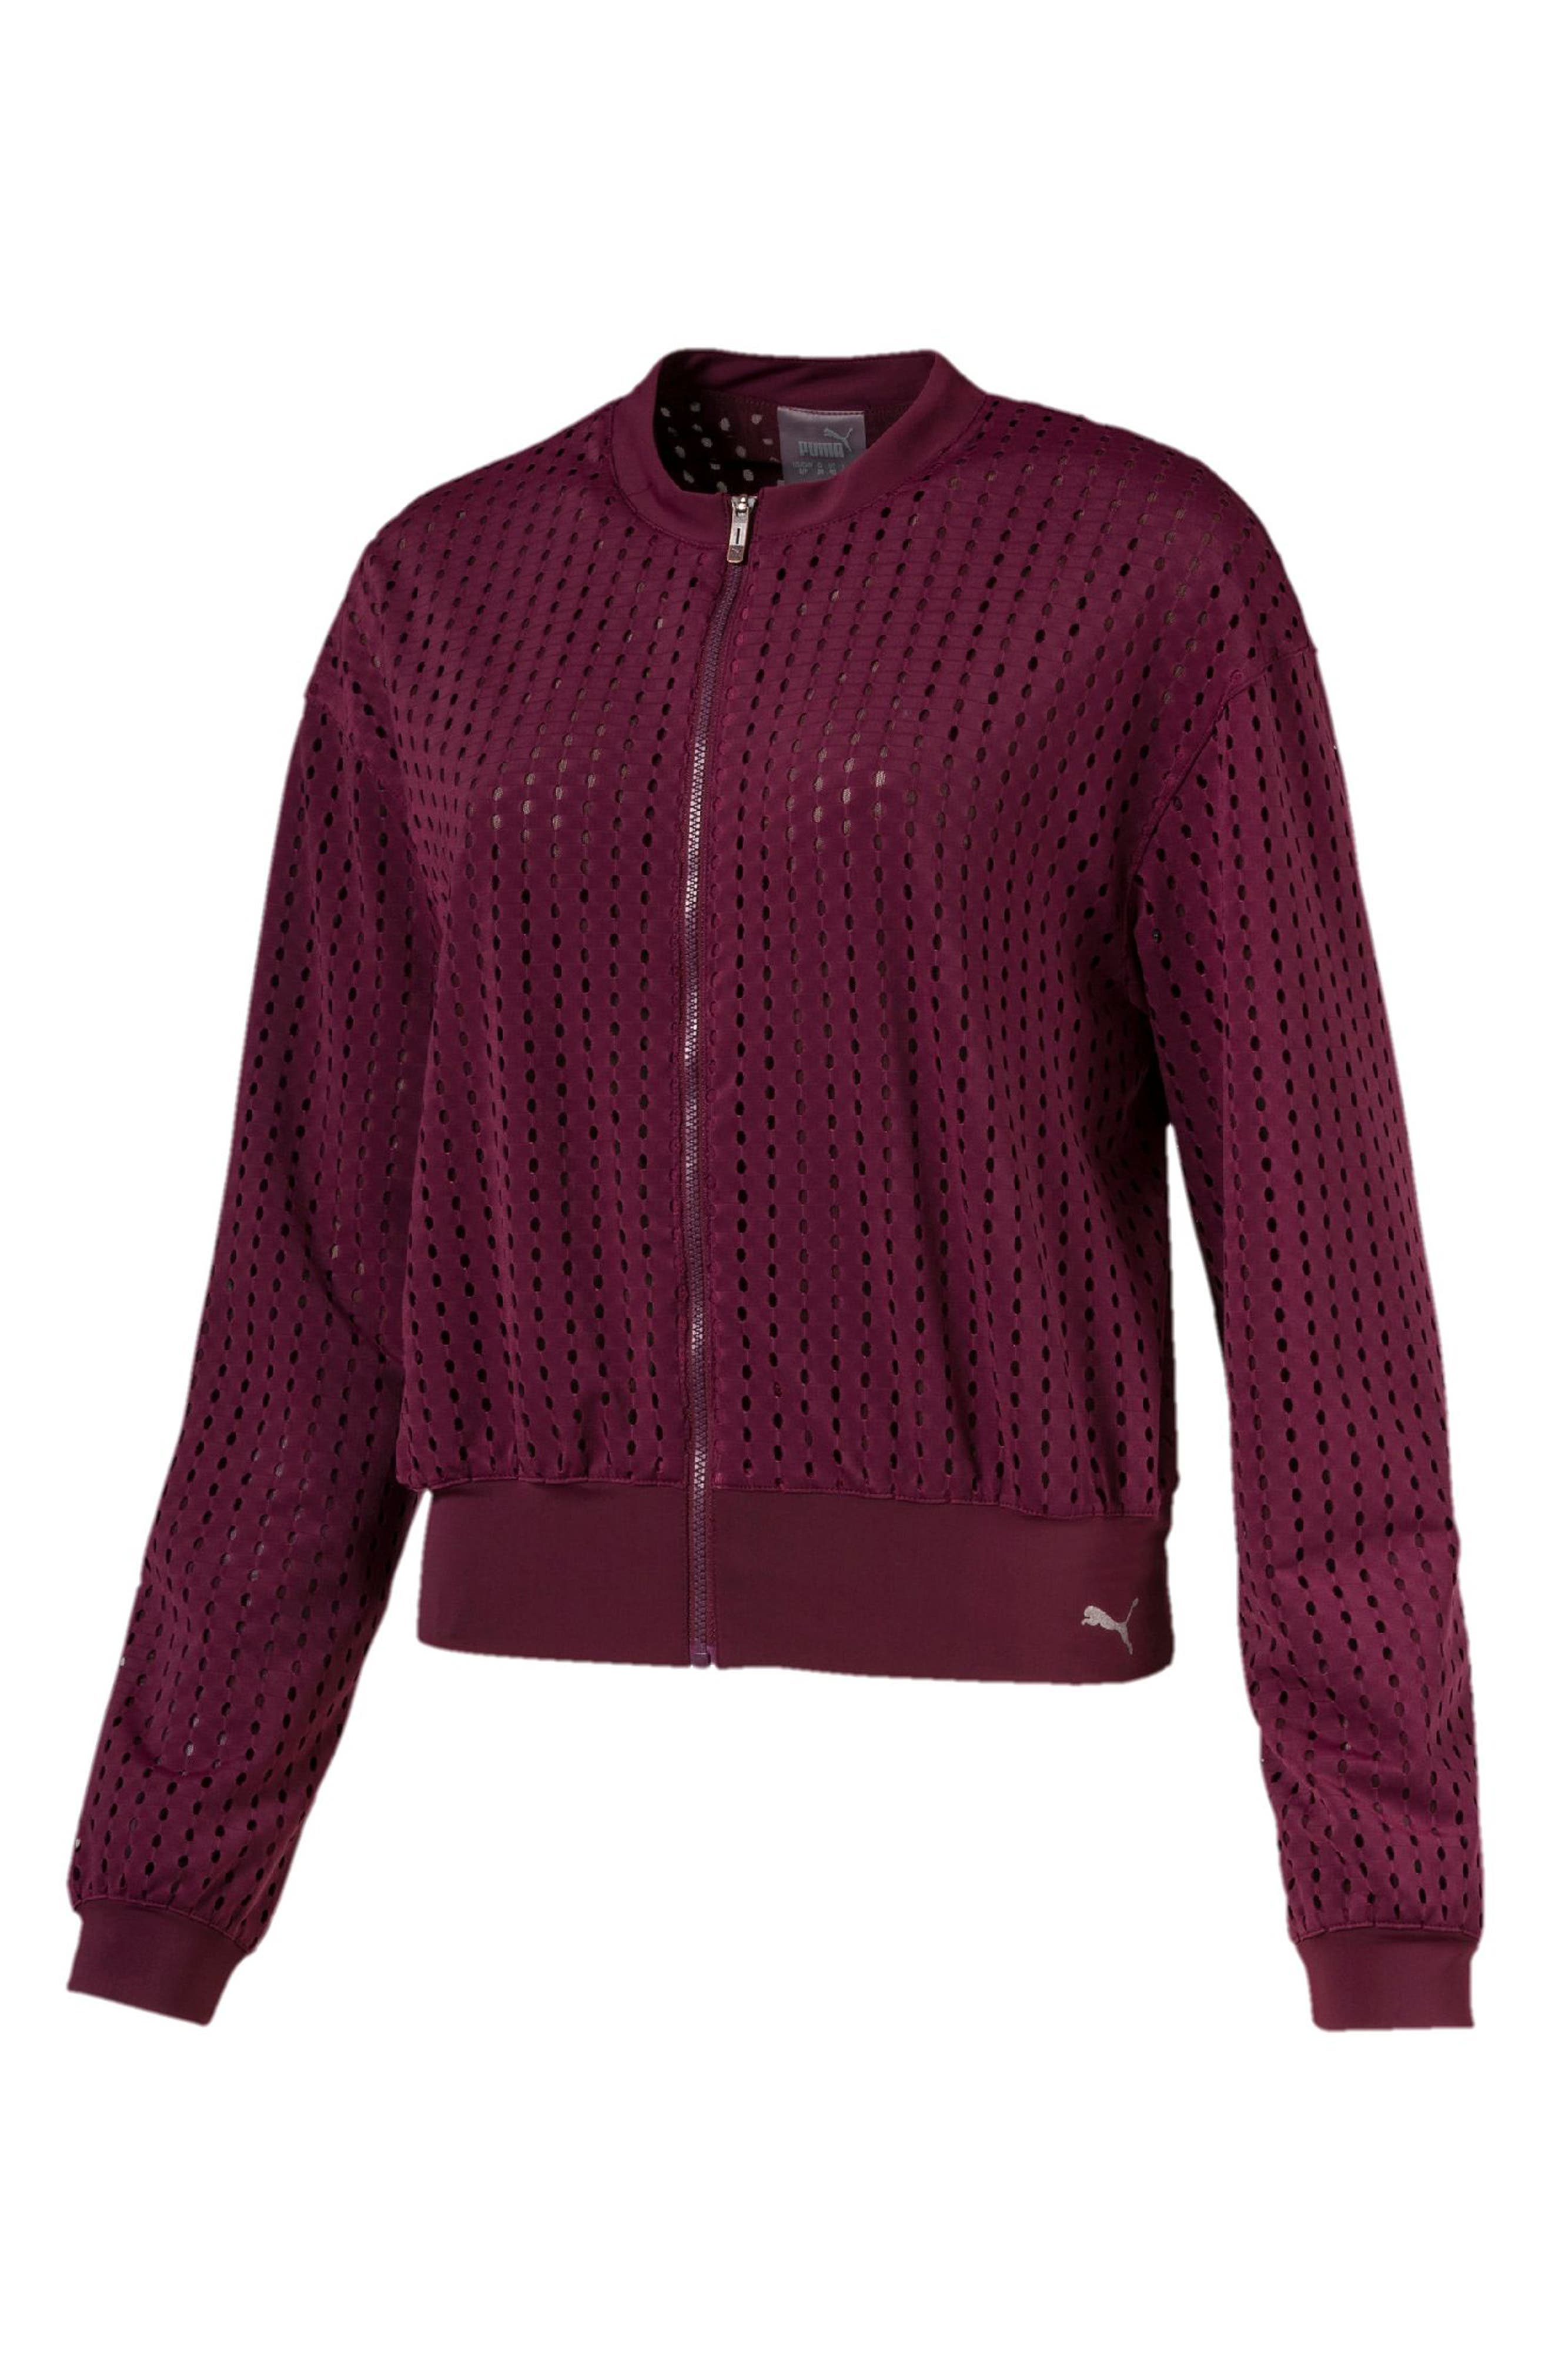 Puma Luxe Jacket, Burgundy